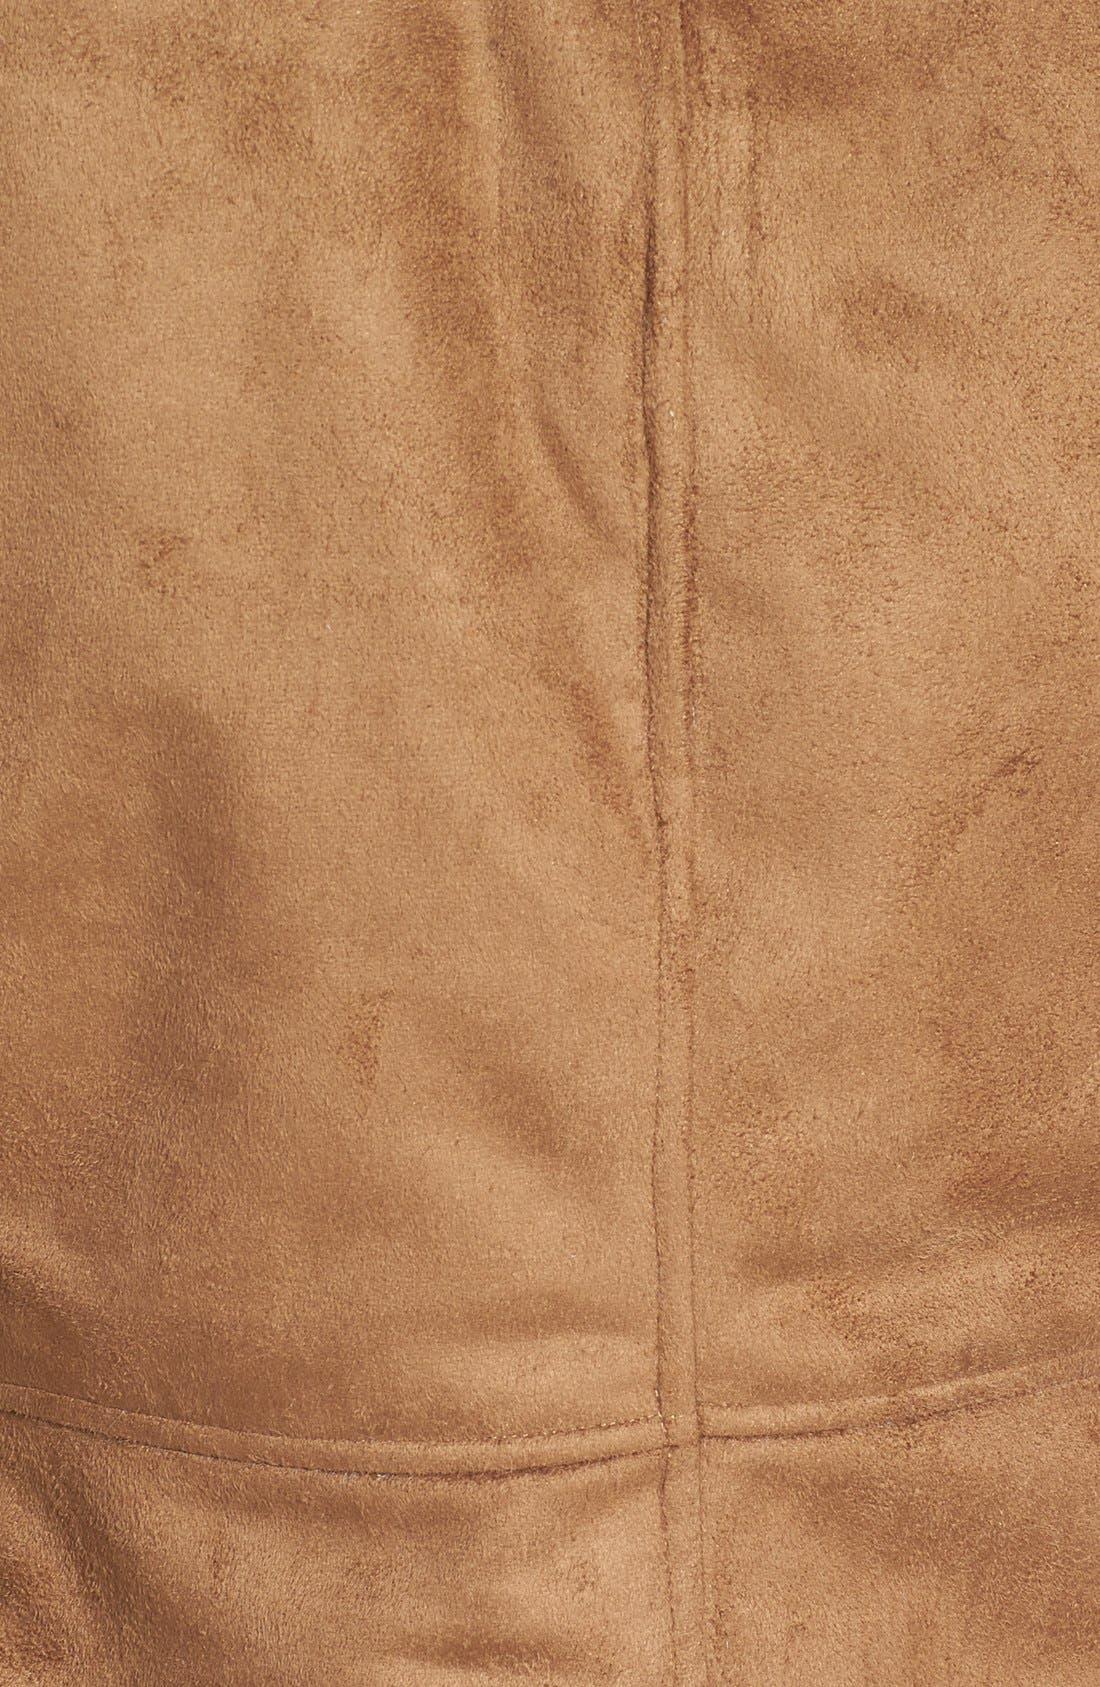 Bourne Faux Shearling Jacket,                             Alternate thumbnail 5, color,                             257